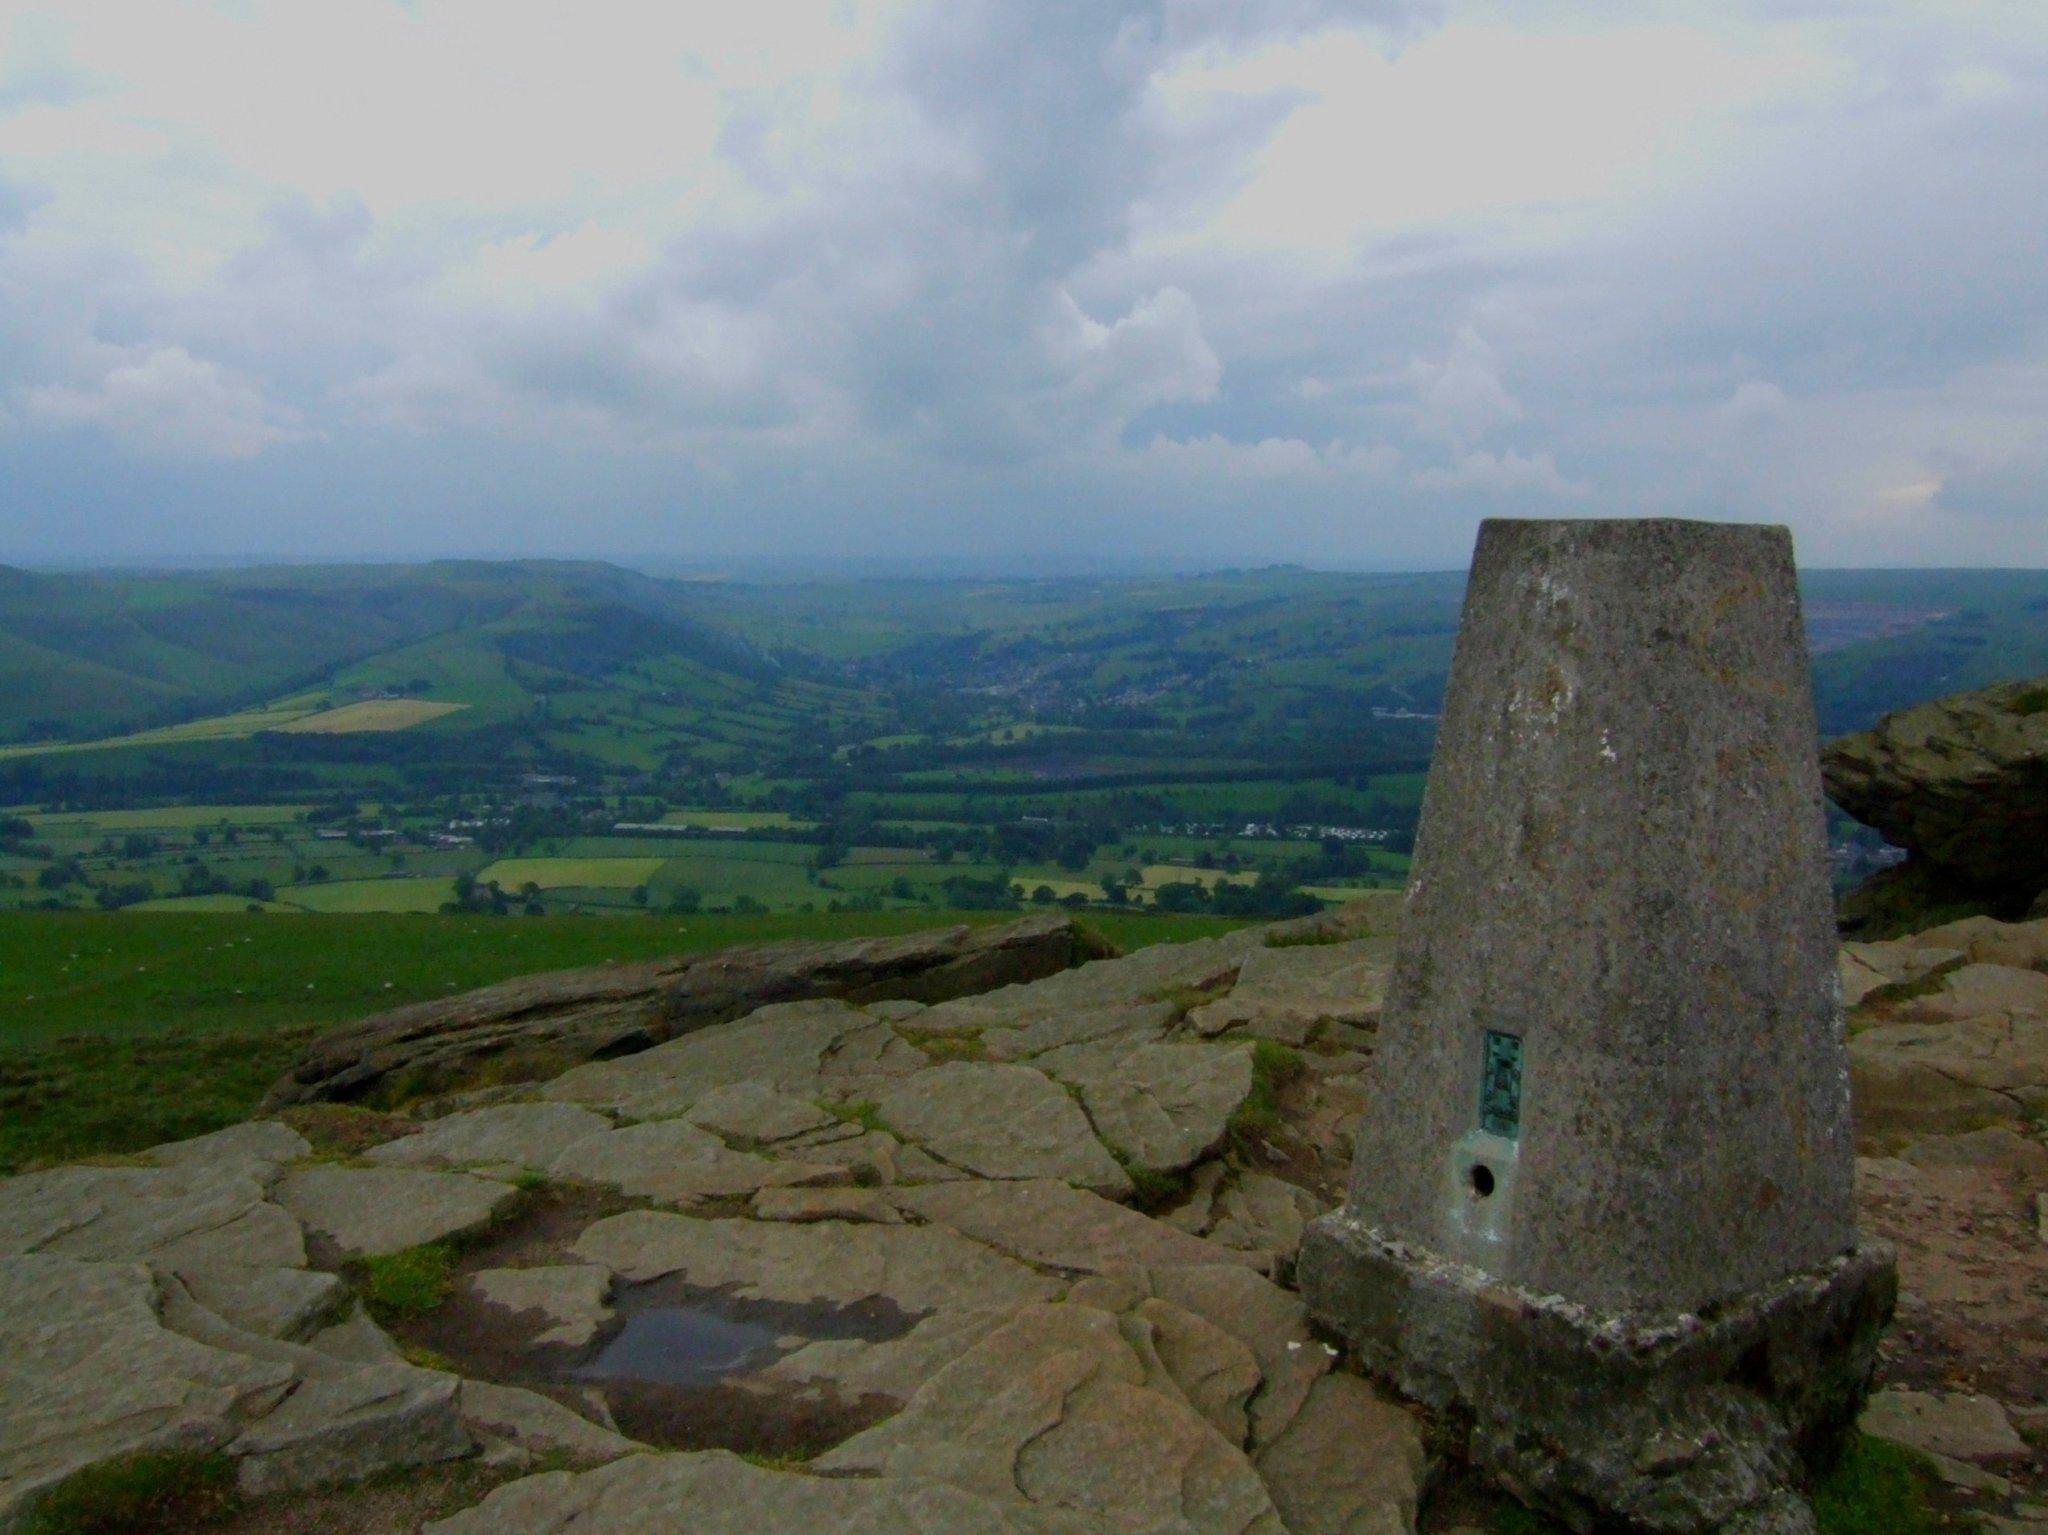 Win Hill, The High Peak